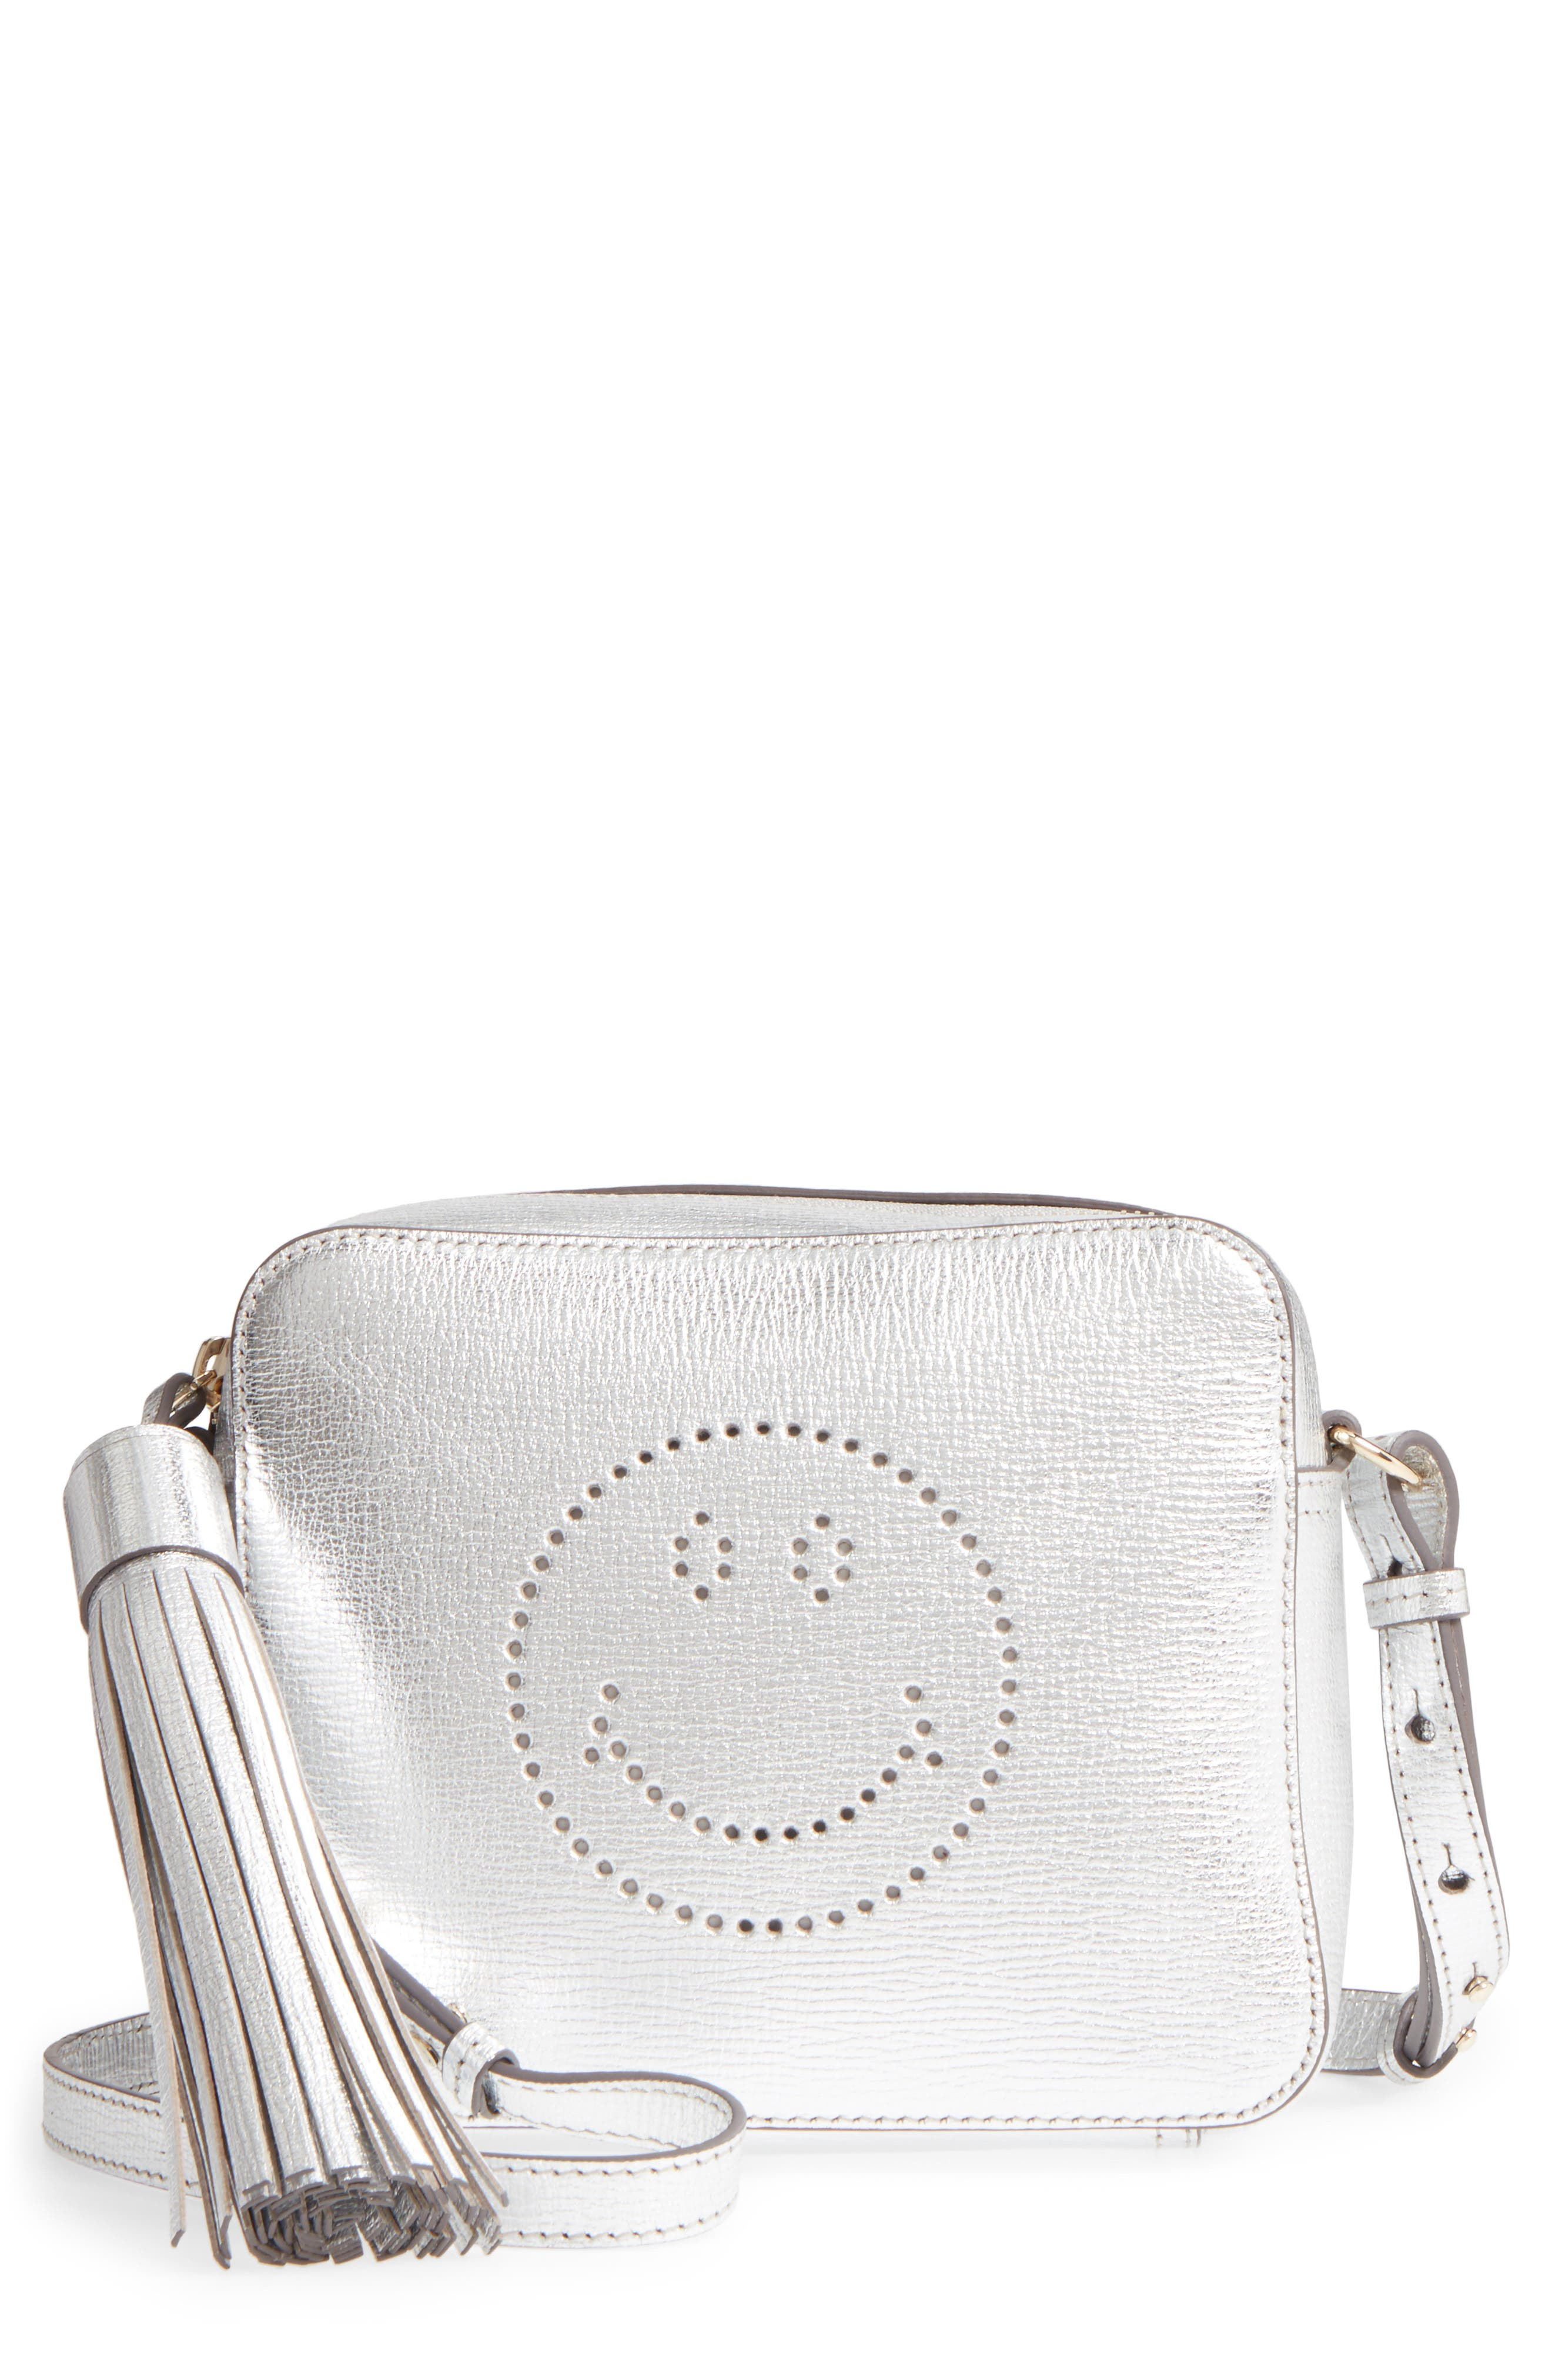 Smiley Metallic Leather Crossbody Bag,                         Main,                         color, 040